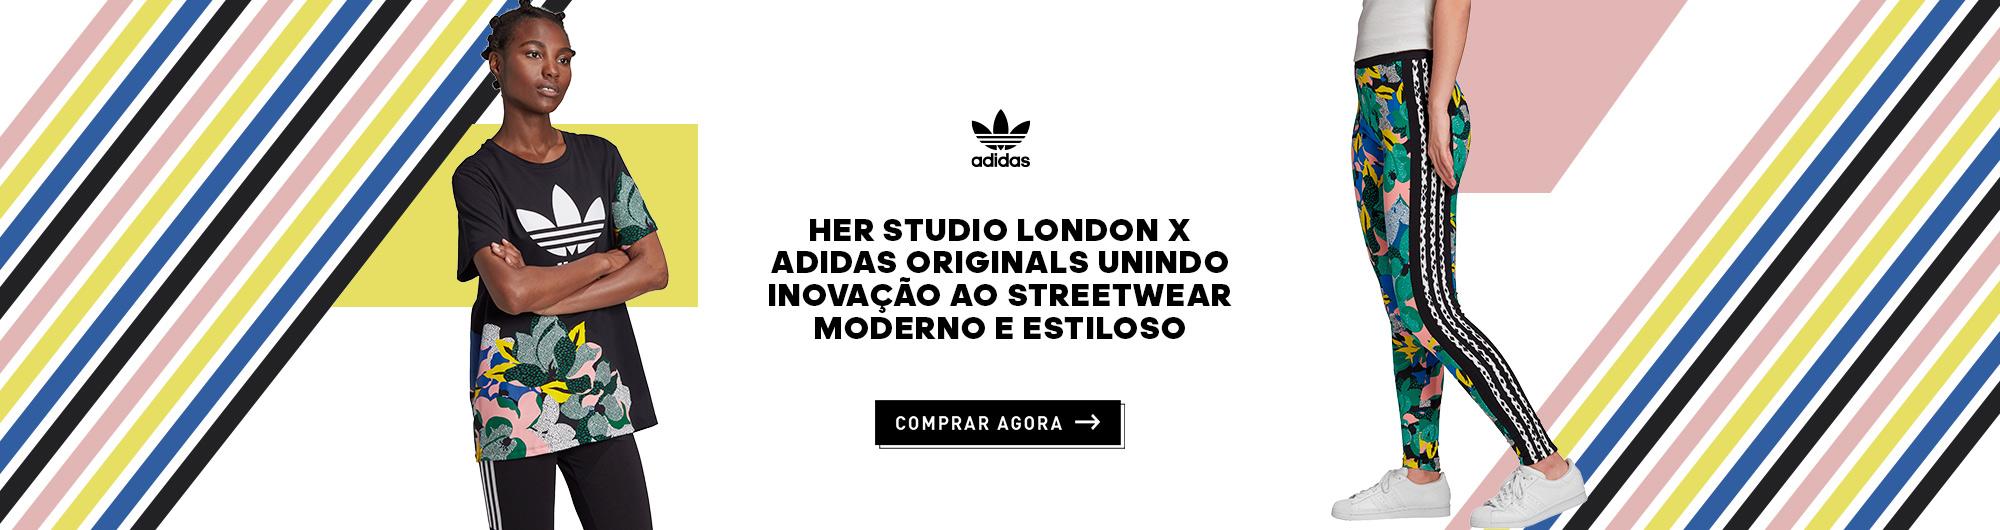 adidas Her Studio